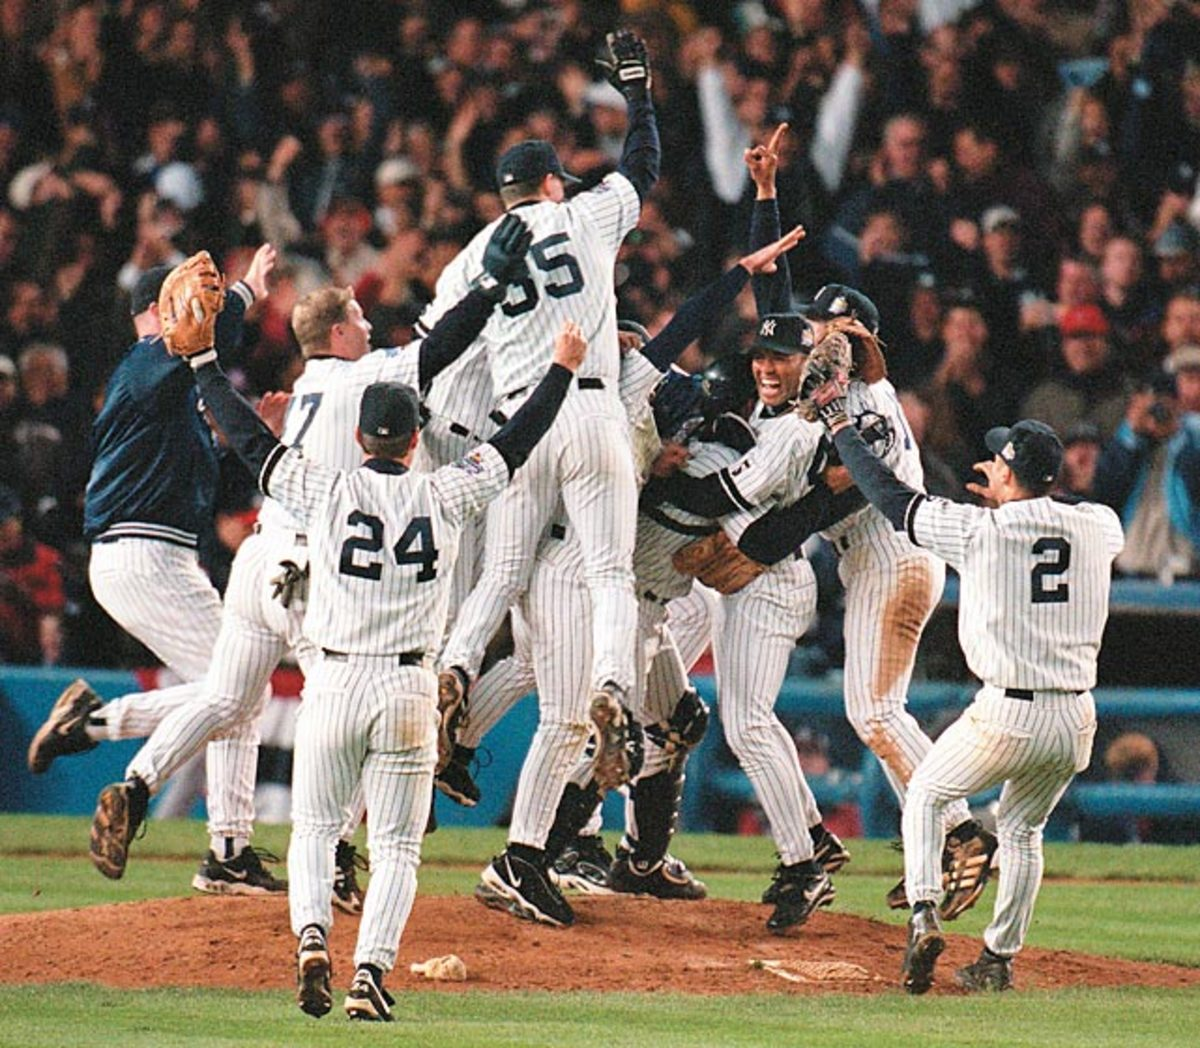 Yankees defeat Braves, 4-0